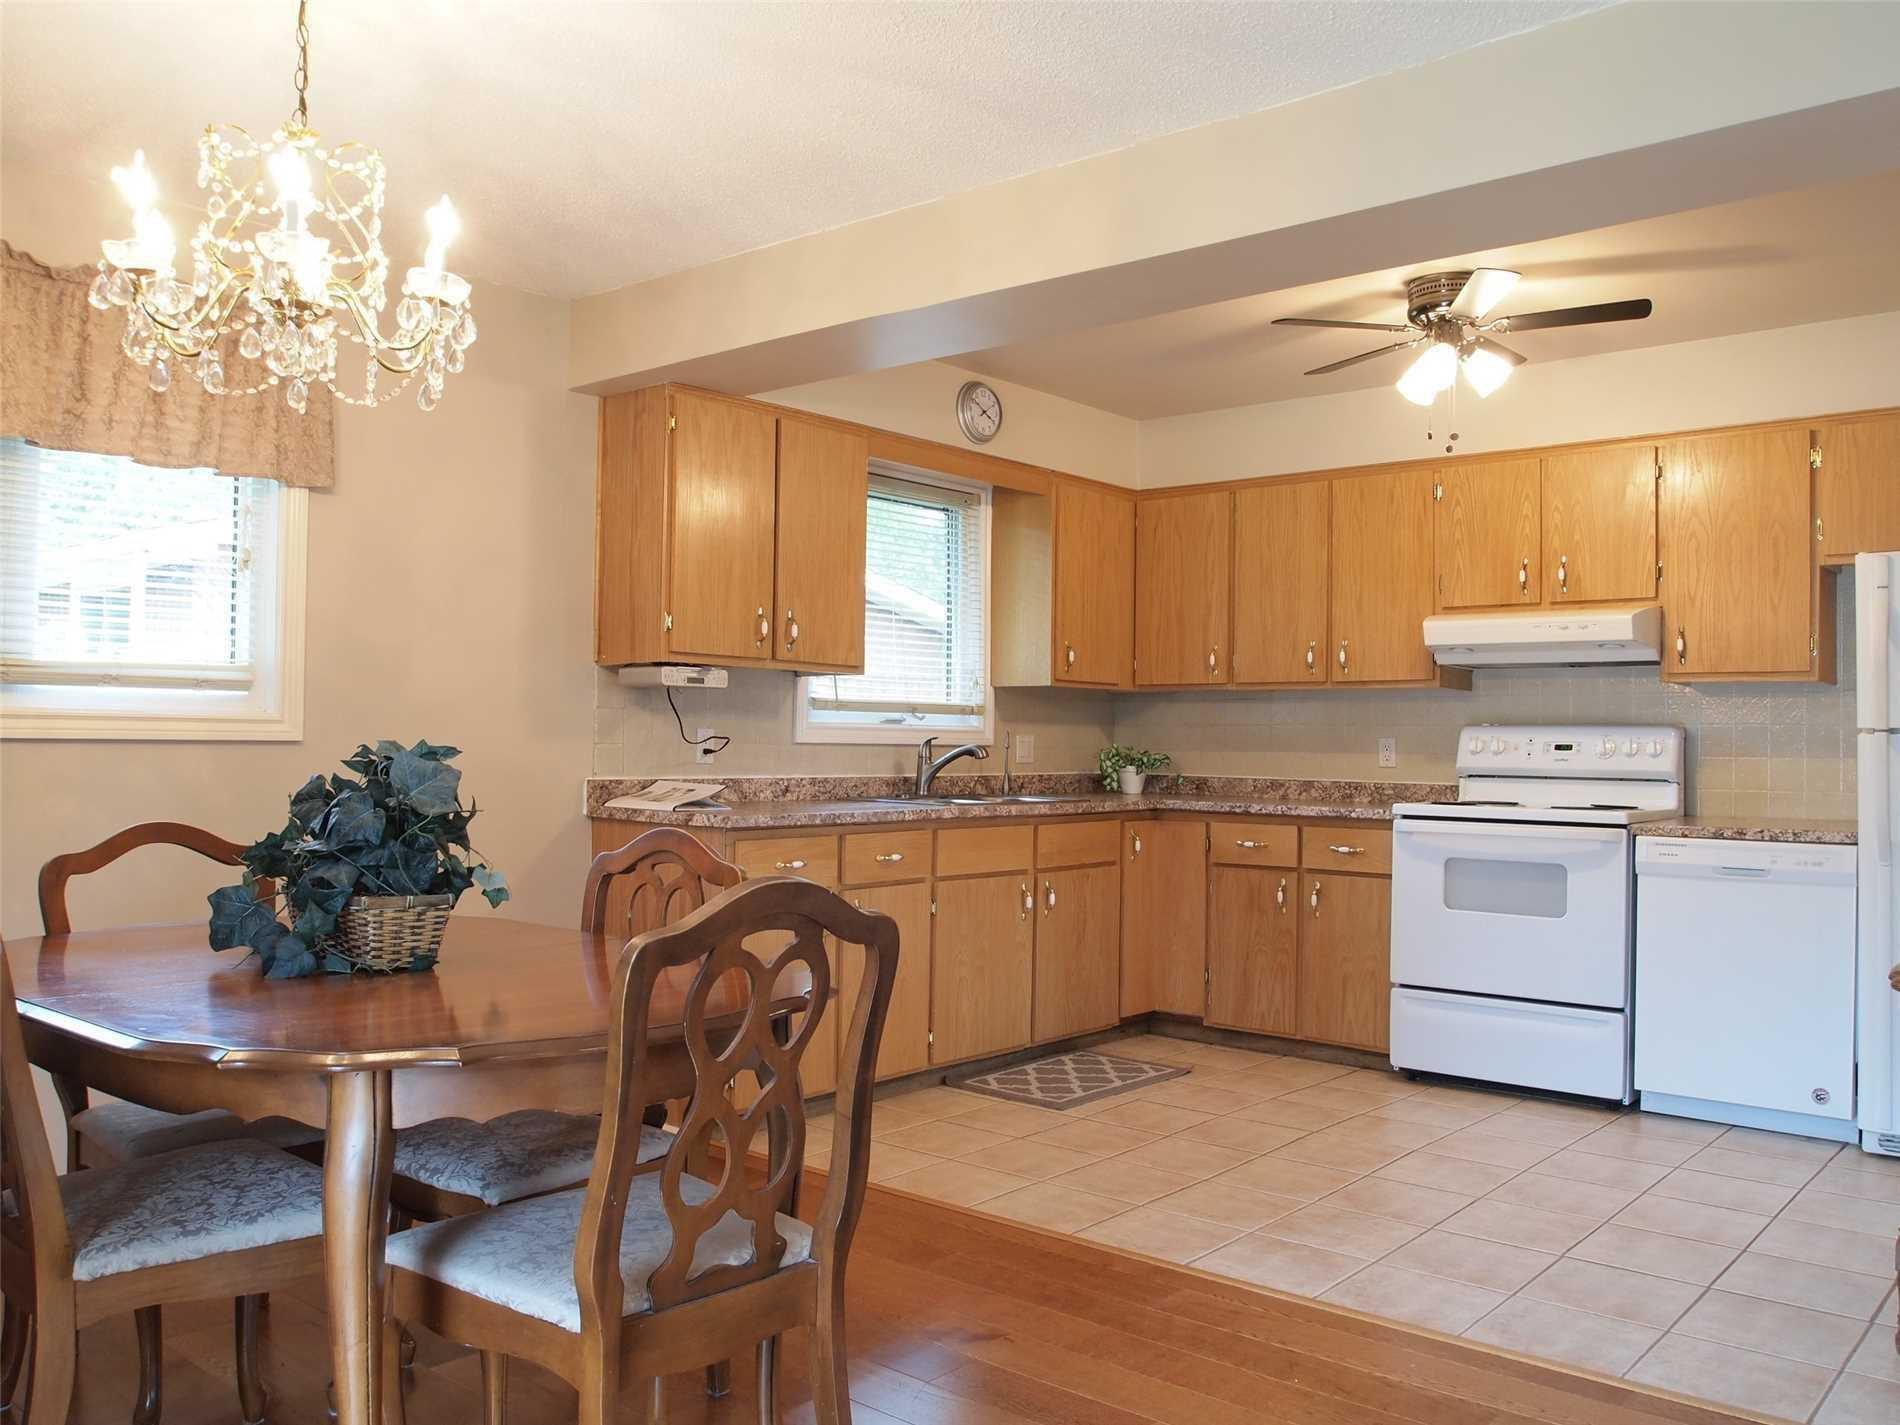 Photo 8: Photos: 105 Fifth Street in Brock: Beaverton House (Bungalow) for sale : MLS®# N4564596